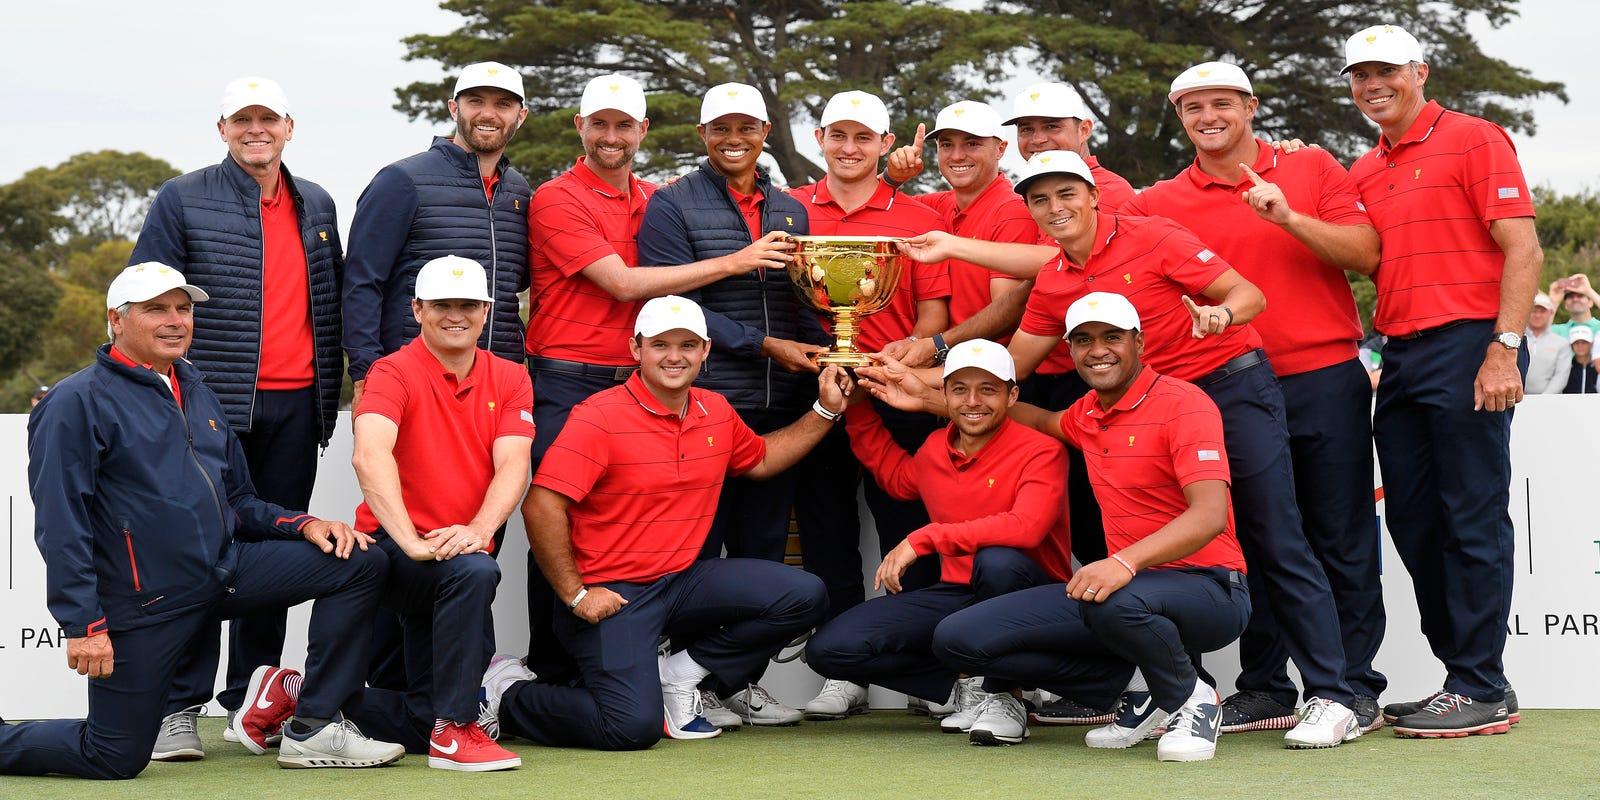 Tony Finau - President's Cup Win